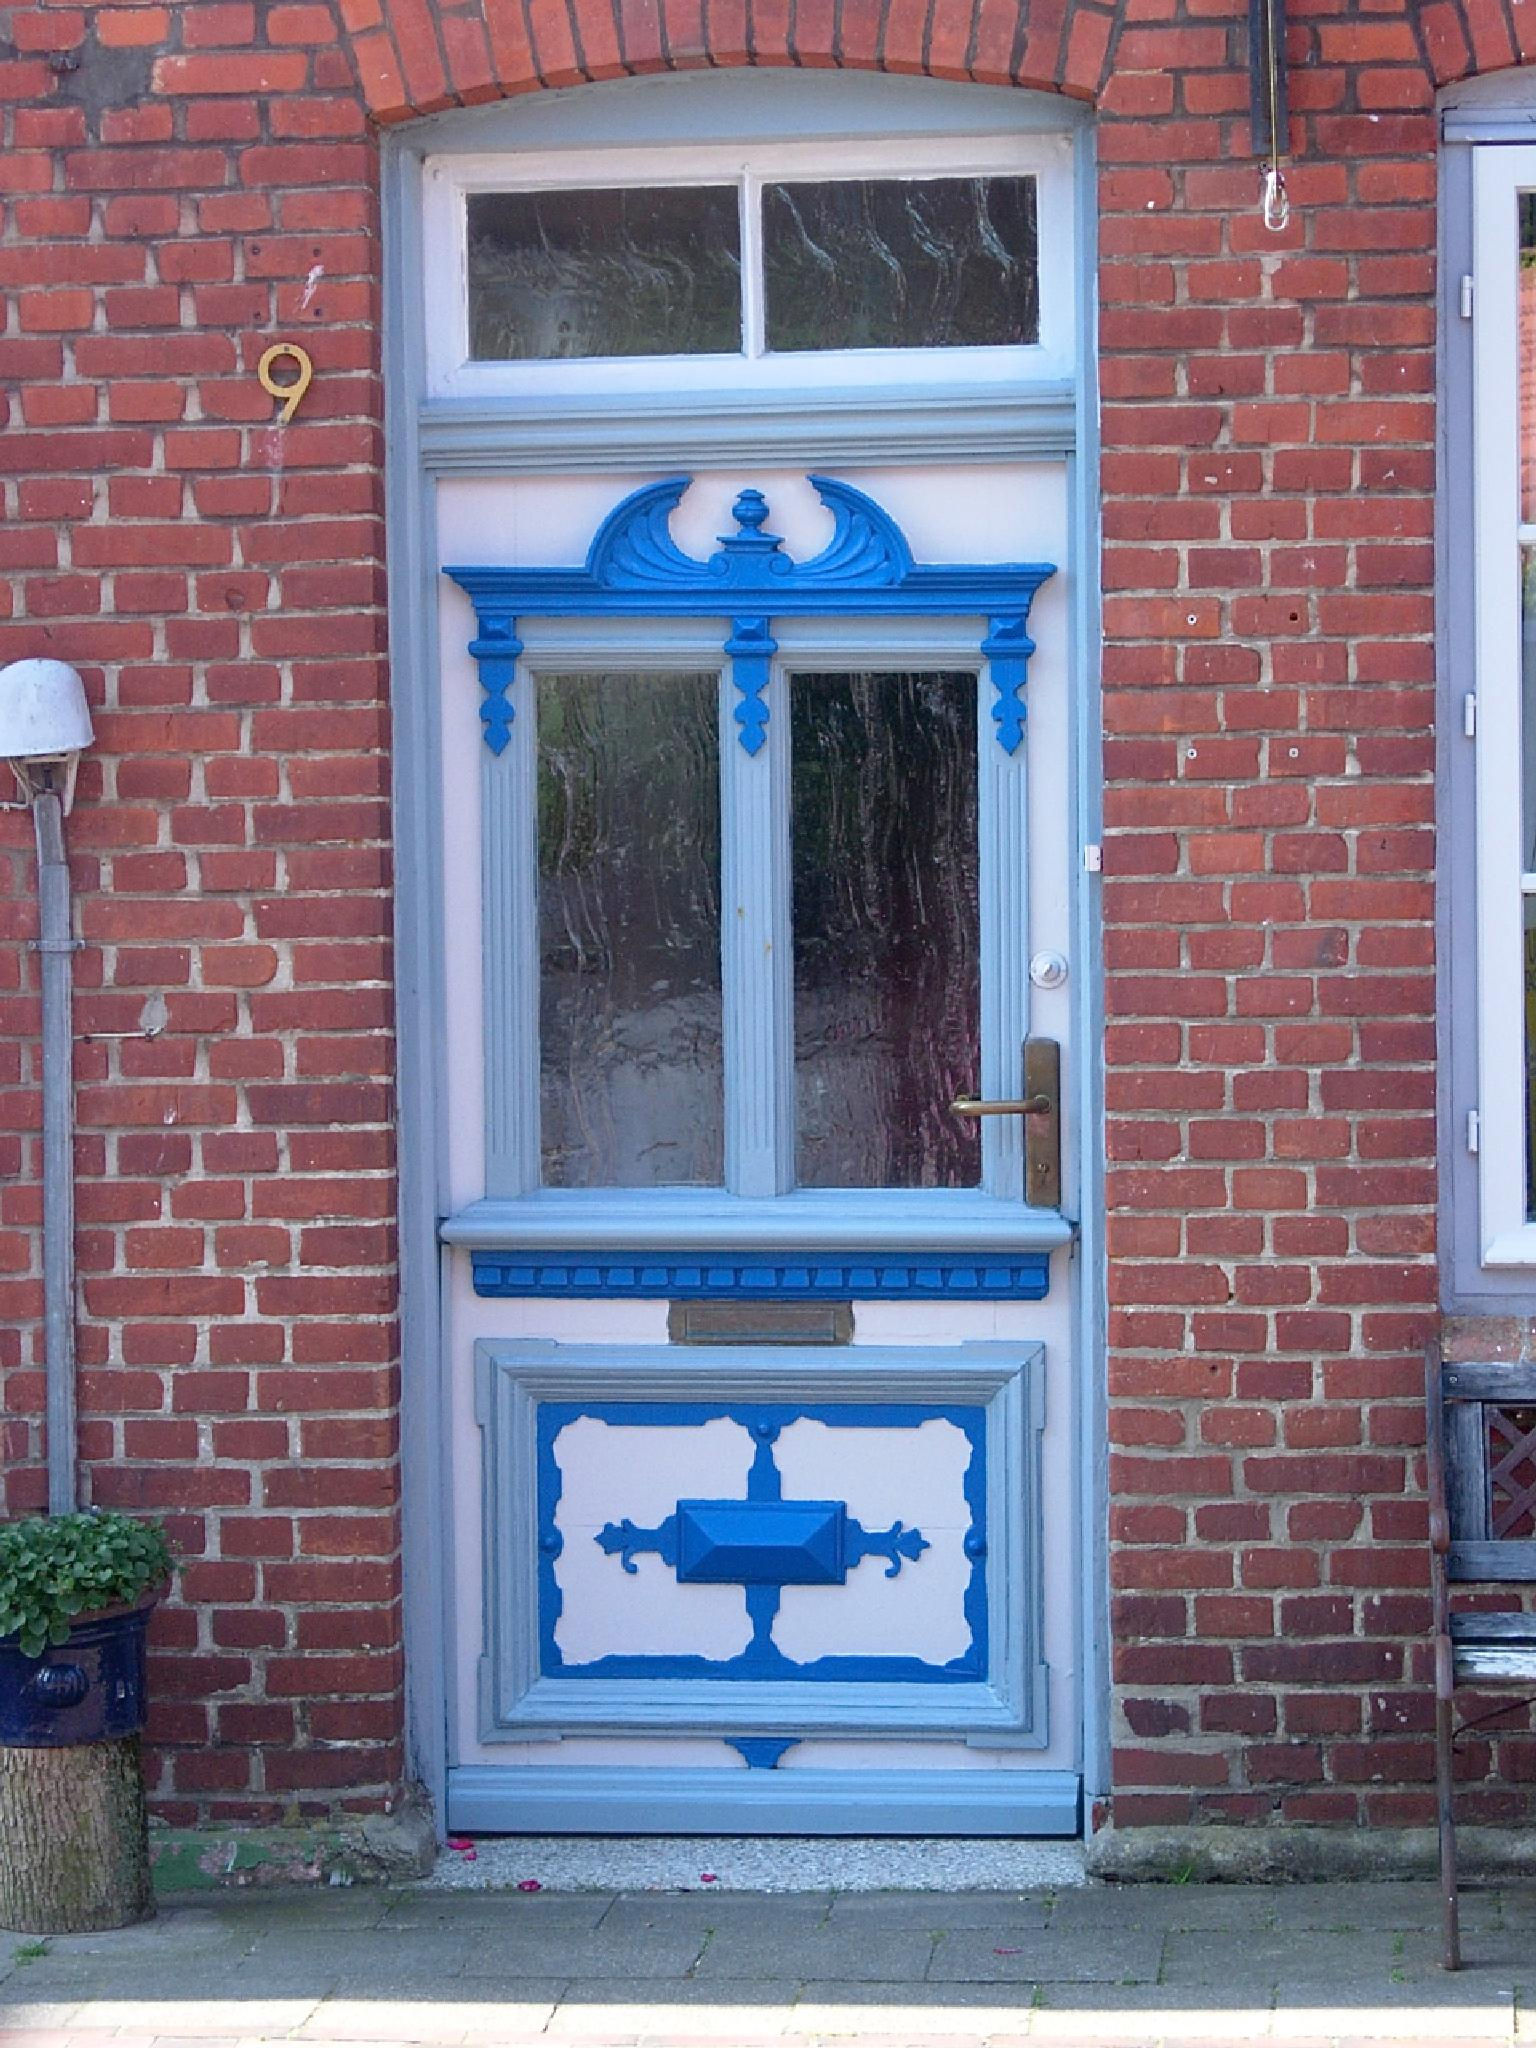 North Friesian Door (19) by Katy Haecker